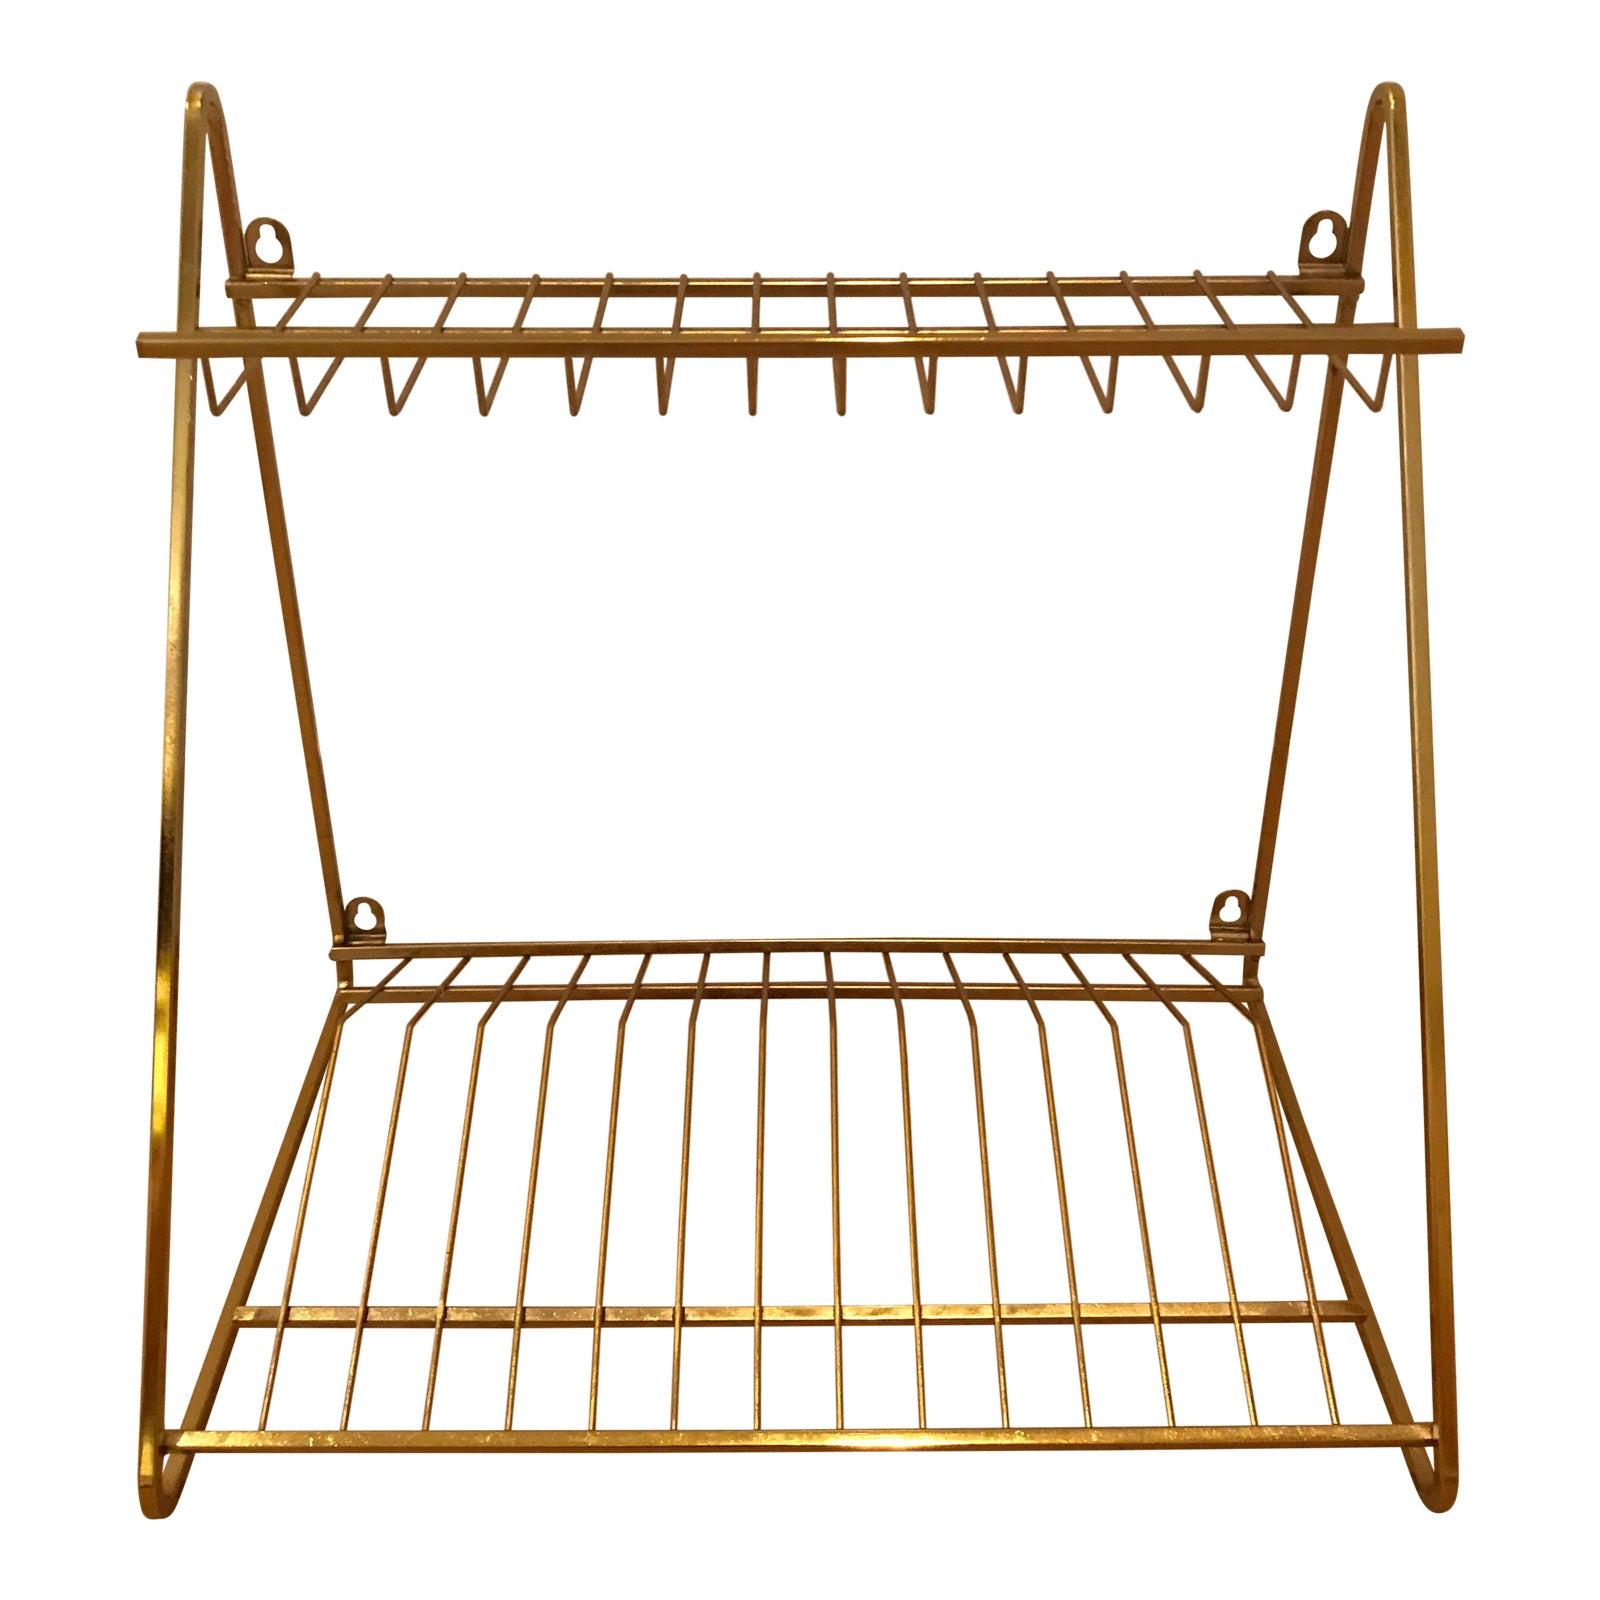 Cb2 Gold Wall Mounted Dish Drying Rack Chairish